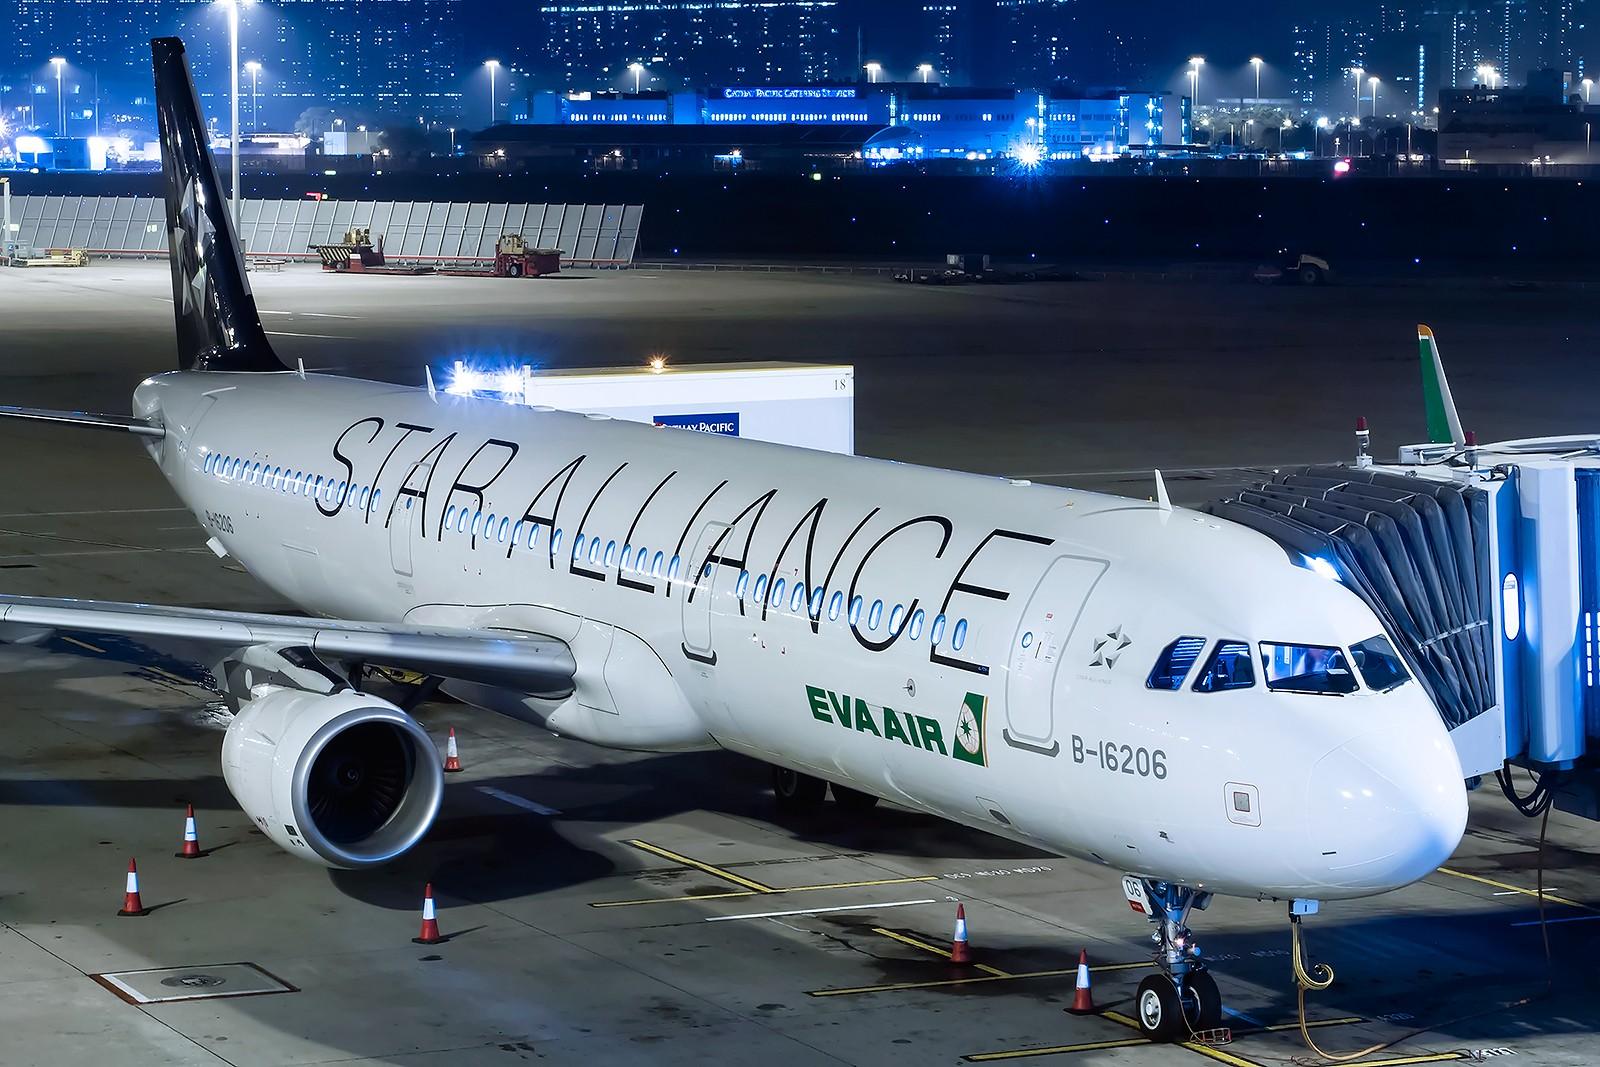 Re:[原创]夜太美 AIRBUS A321-200 B-16206 中国香港赤鱲角国际机场